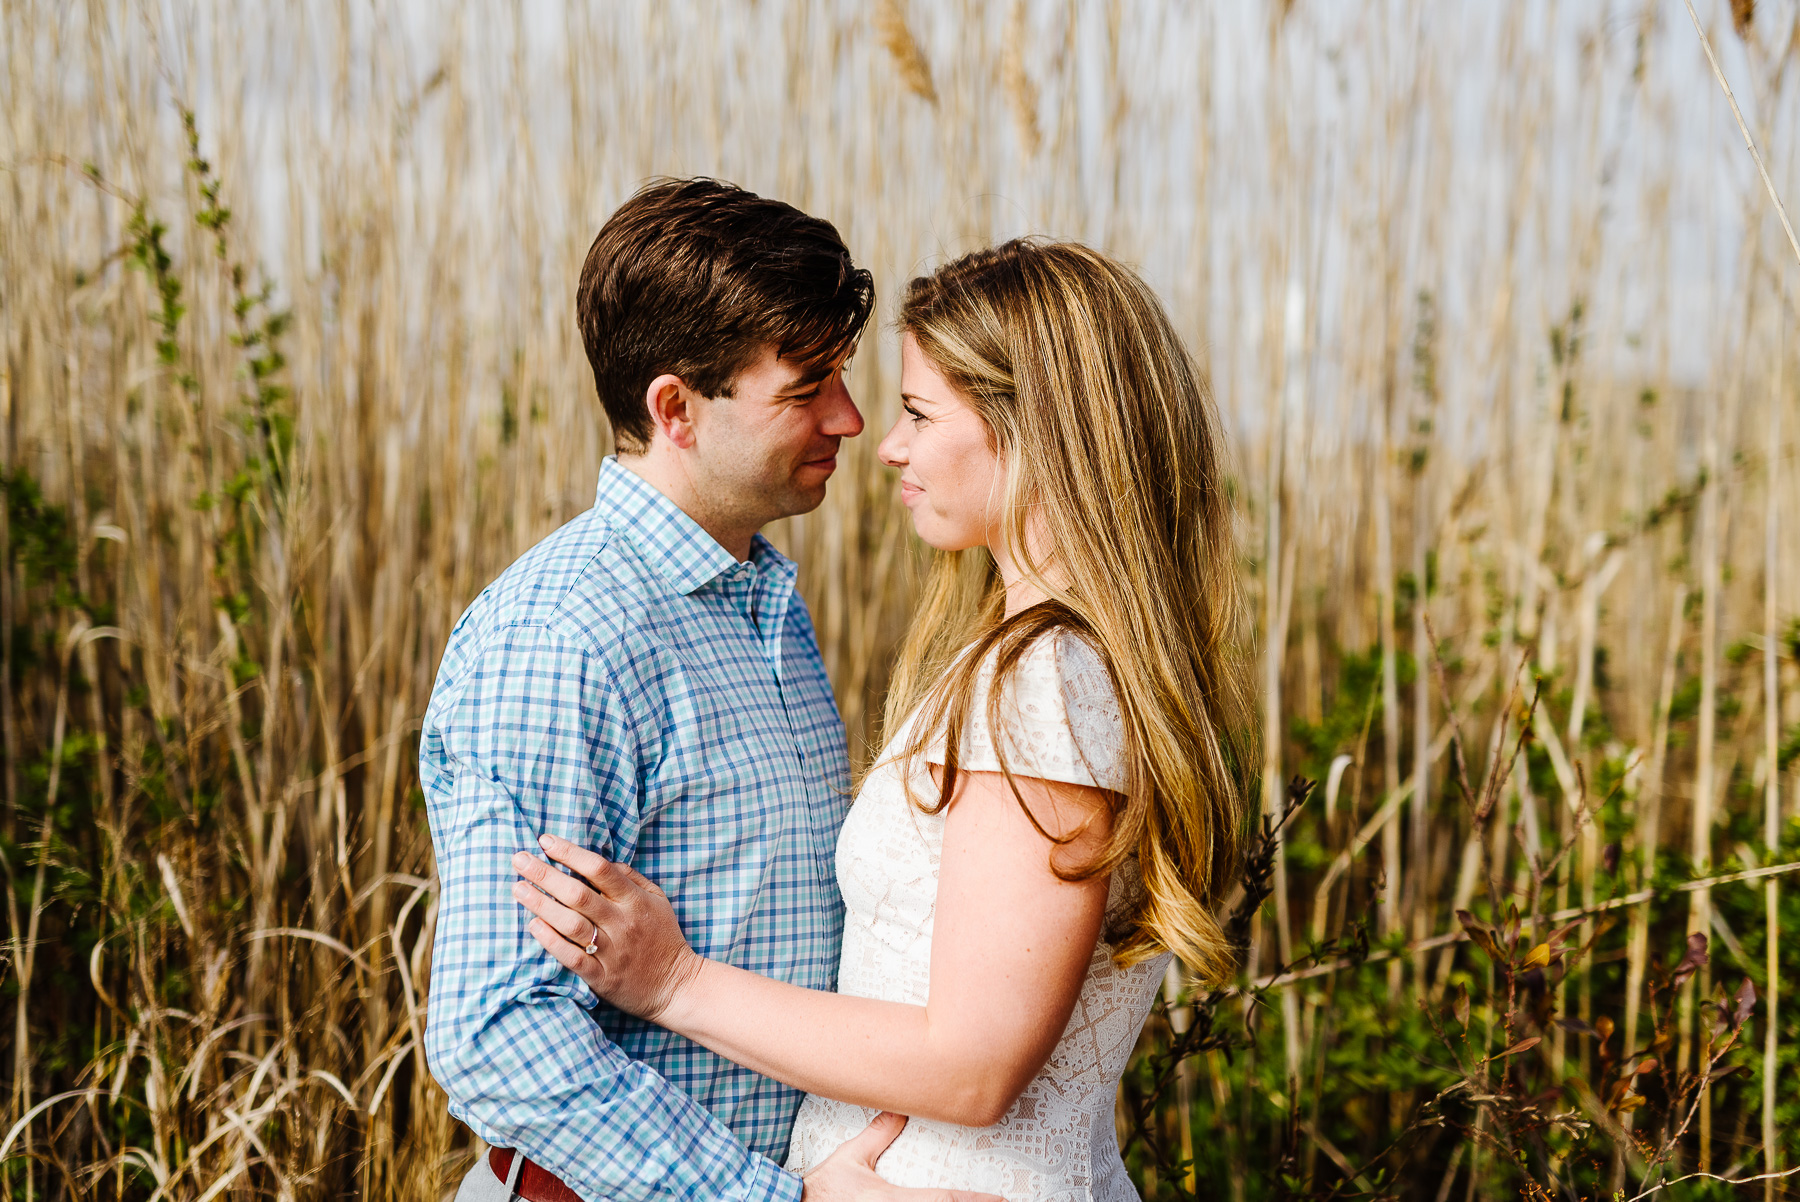 21-Bay Head NJ Engagement New Jersery Engagement Photographer NYC Engagements Brooklyn Engagement Photos Longbrook Photography.jpg